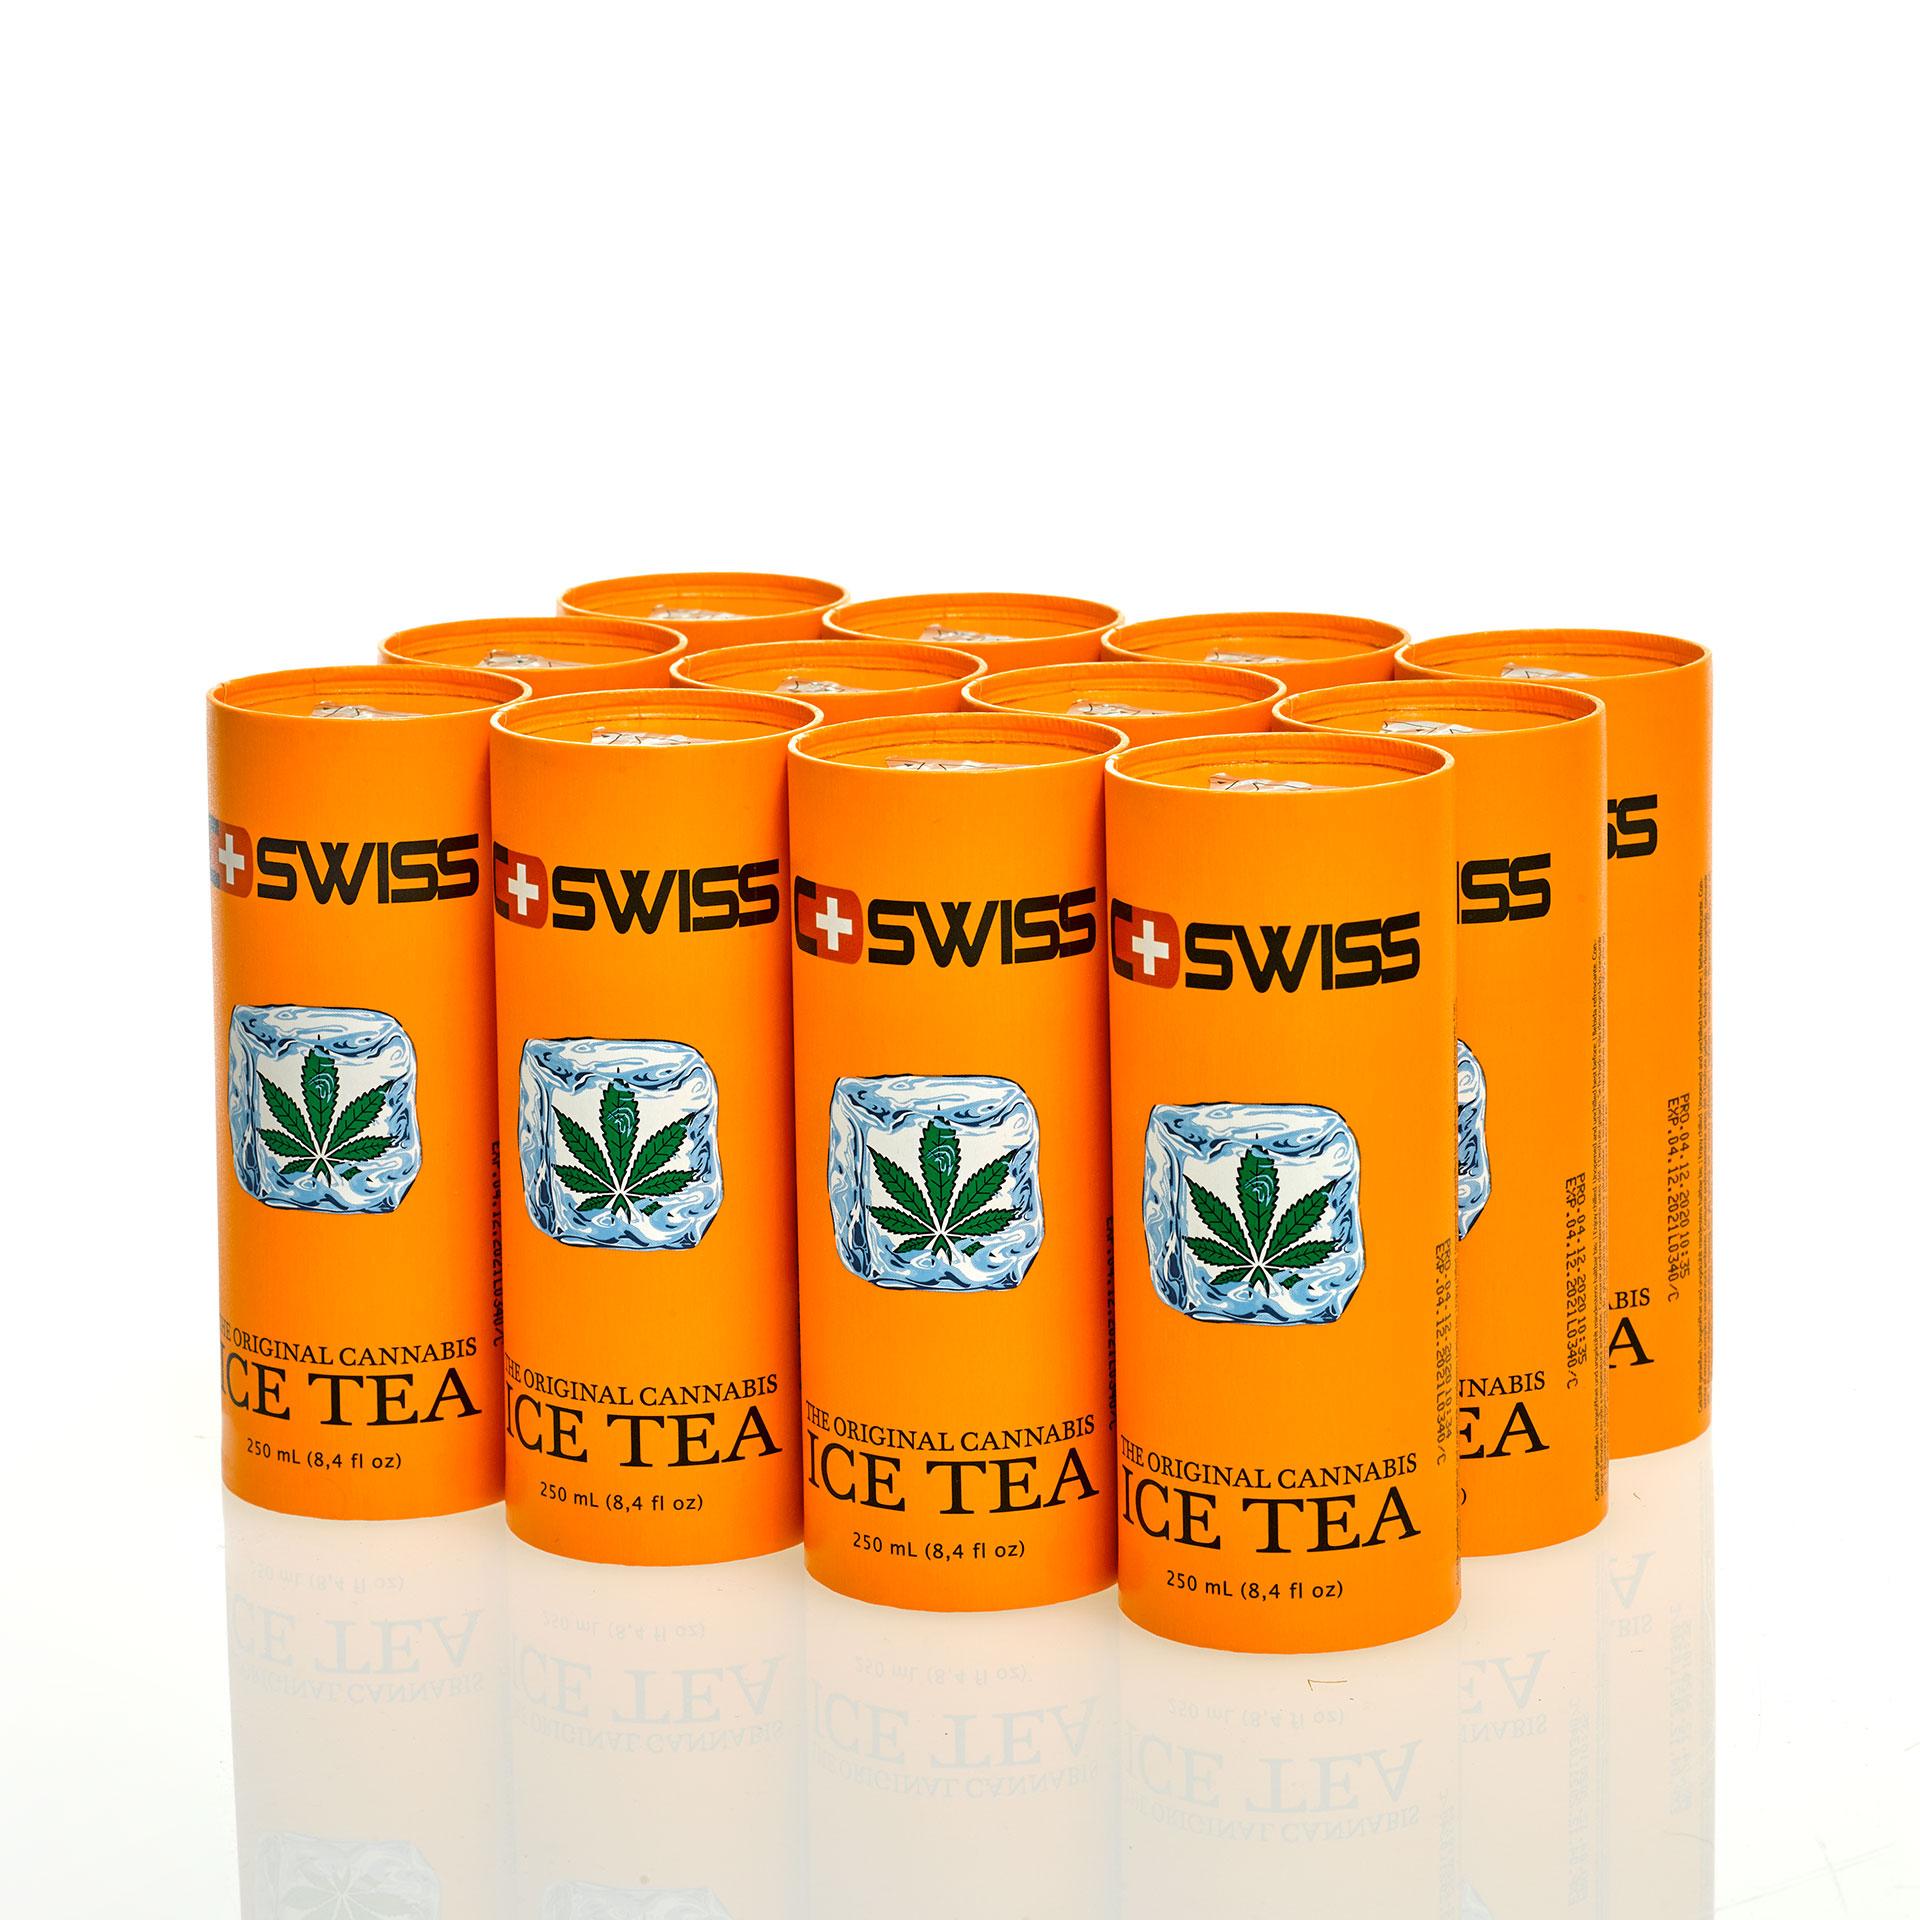 hanfliebe-cswiss-12x-cannabis-ice-tea-25